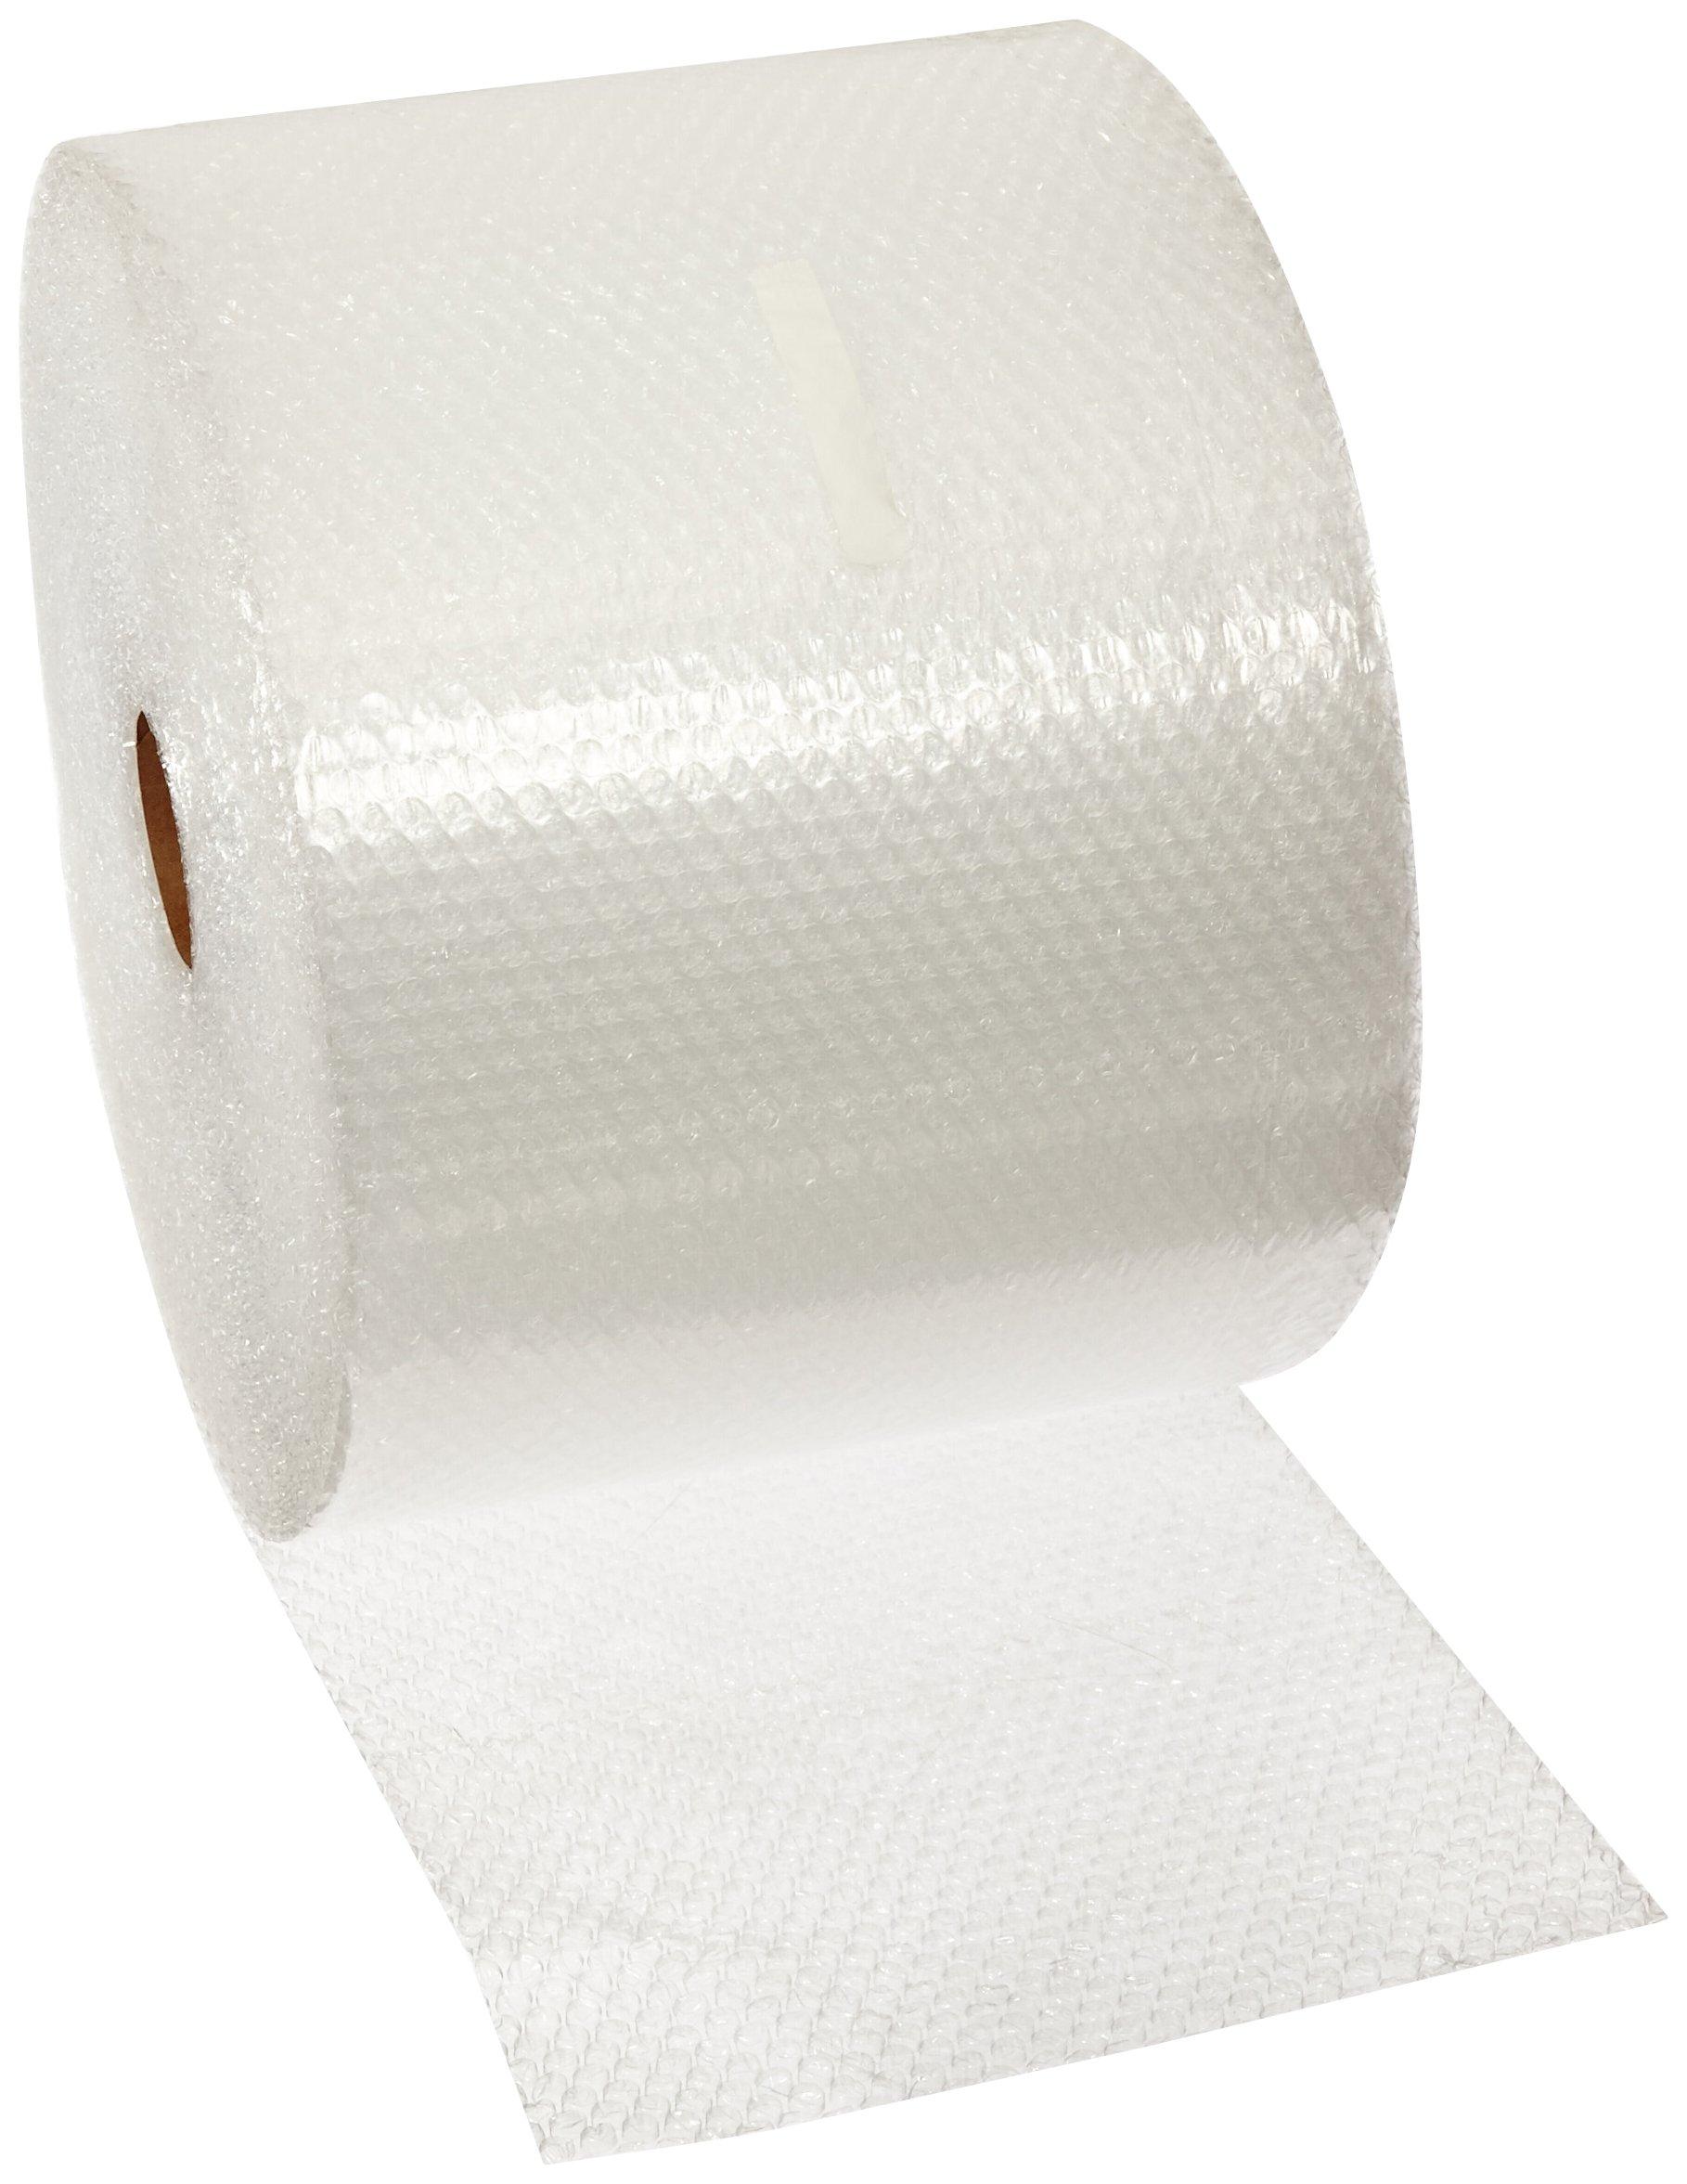 Pratt Polyethylene Economy Perforated Bubble Roll, PRA3266032,  175' Length x 12'' Width, 3/16'' Thick, Clear